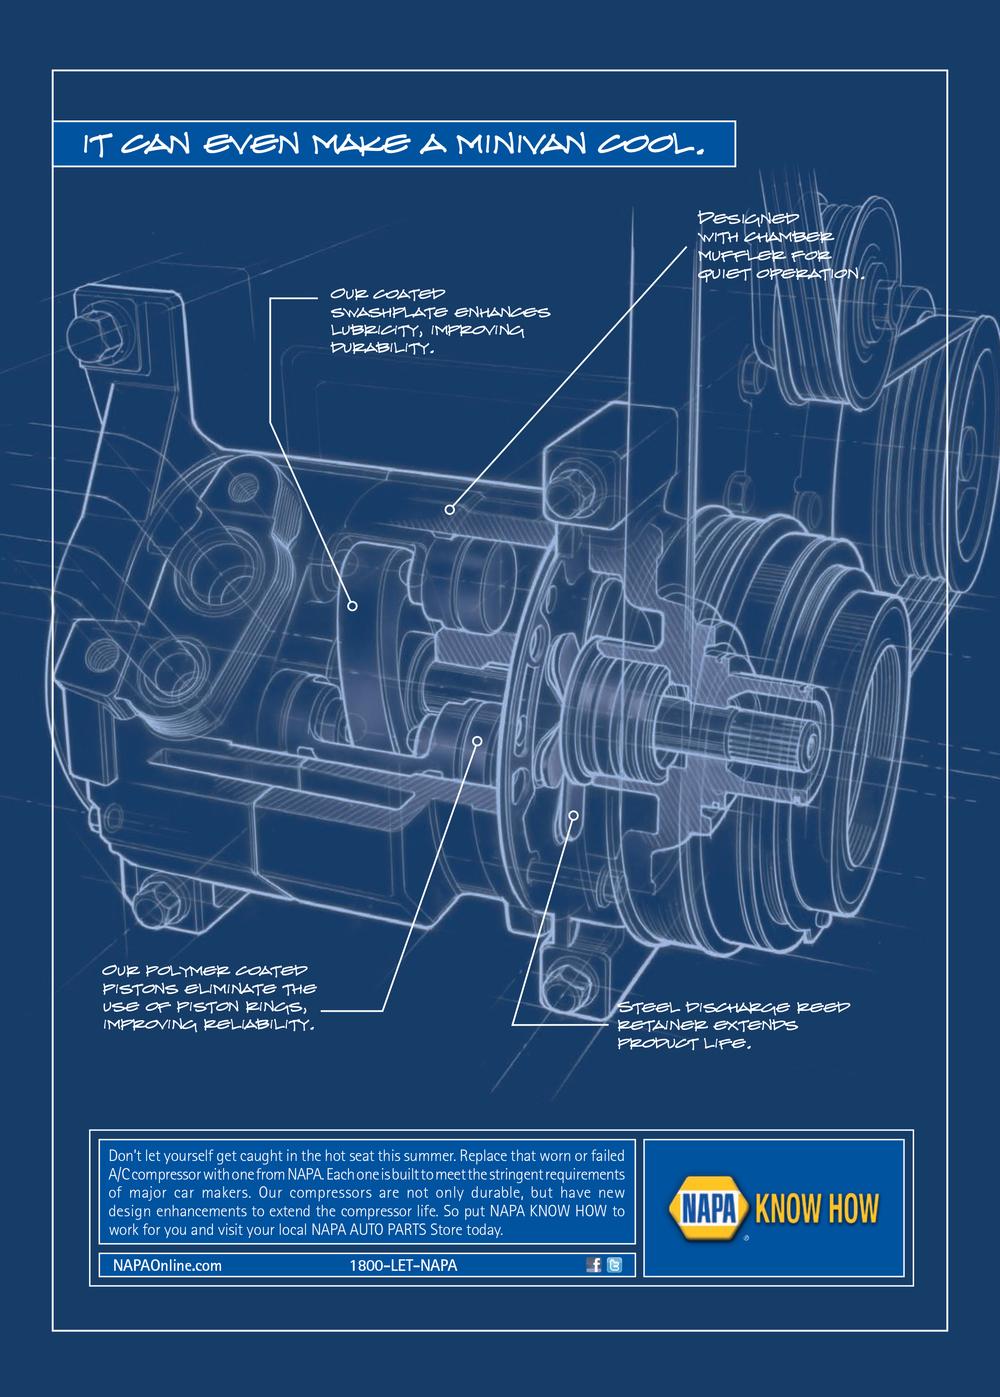 T1-8766A-7 Blueprint 2011 Print Ads_Cropped.jpg